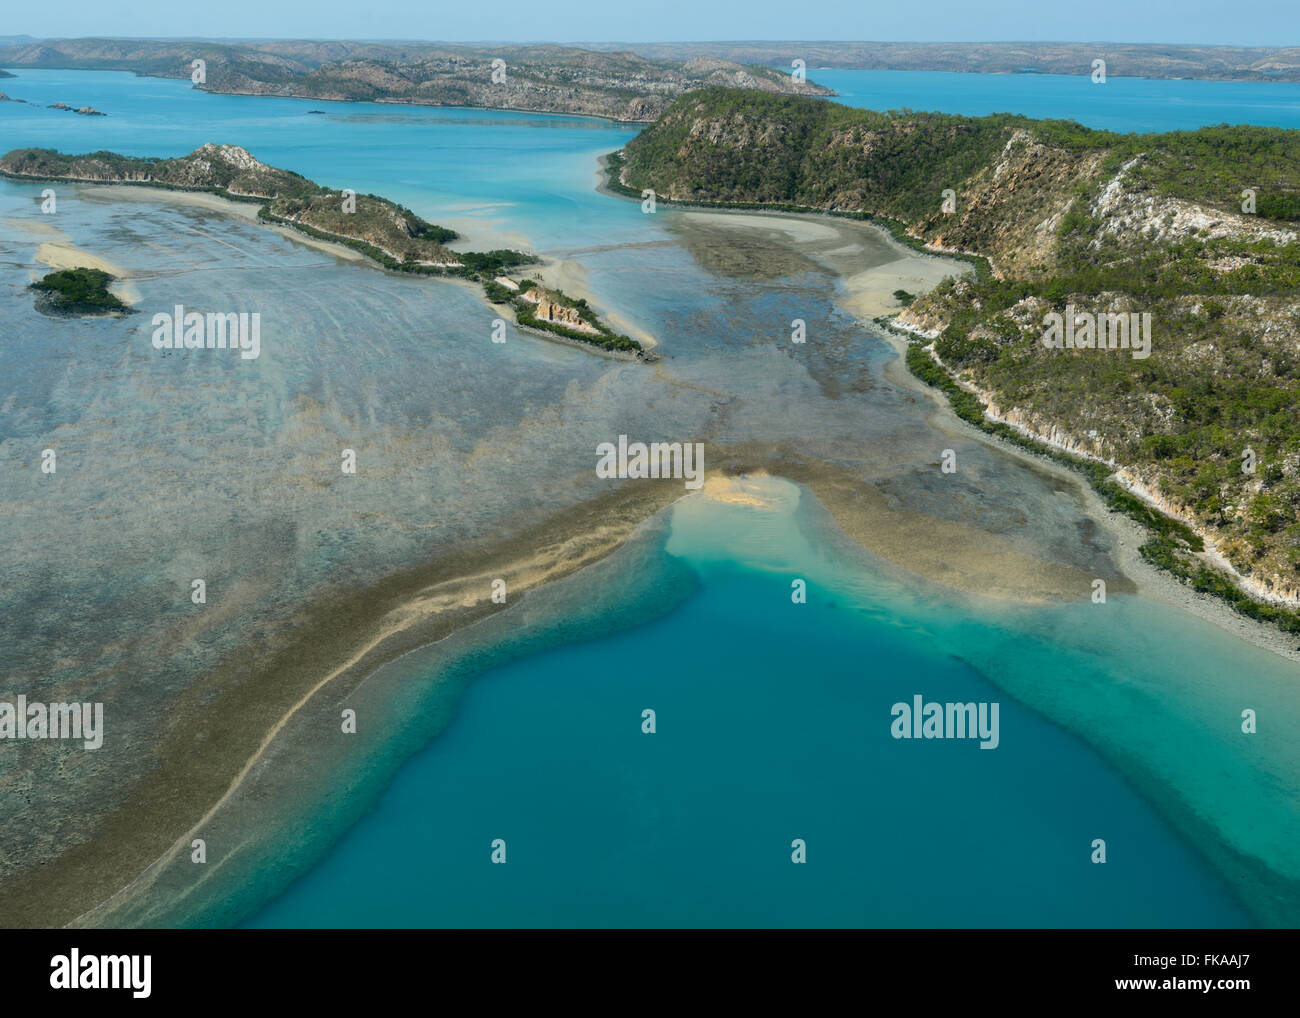 Aerial View of Buccaneer Archipelago, Horizontal Falls, Kimberley Region, Western Australia - Stock Image